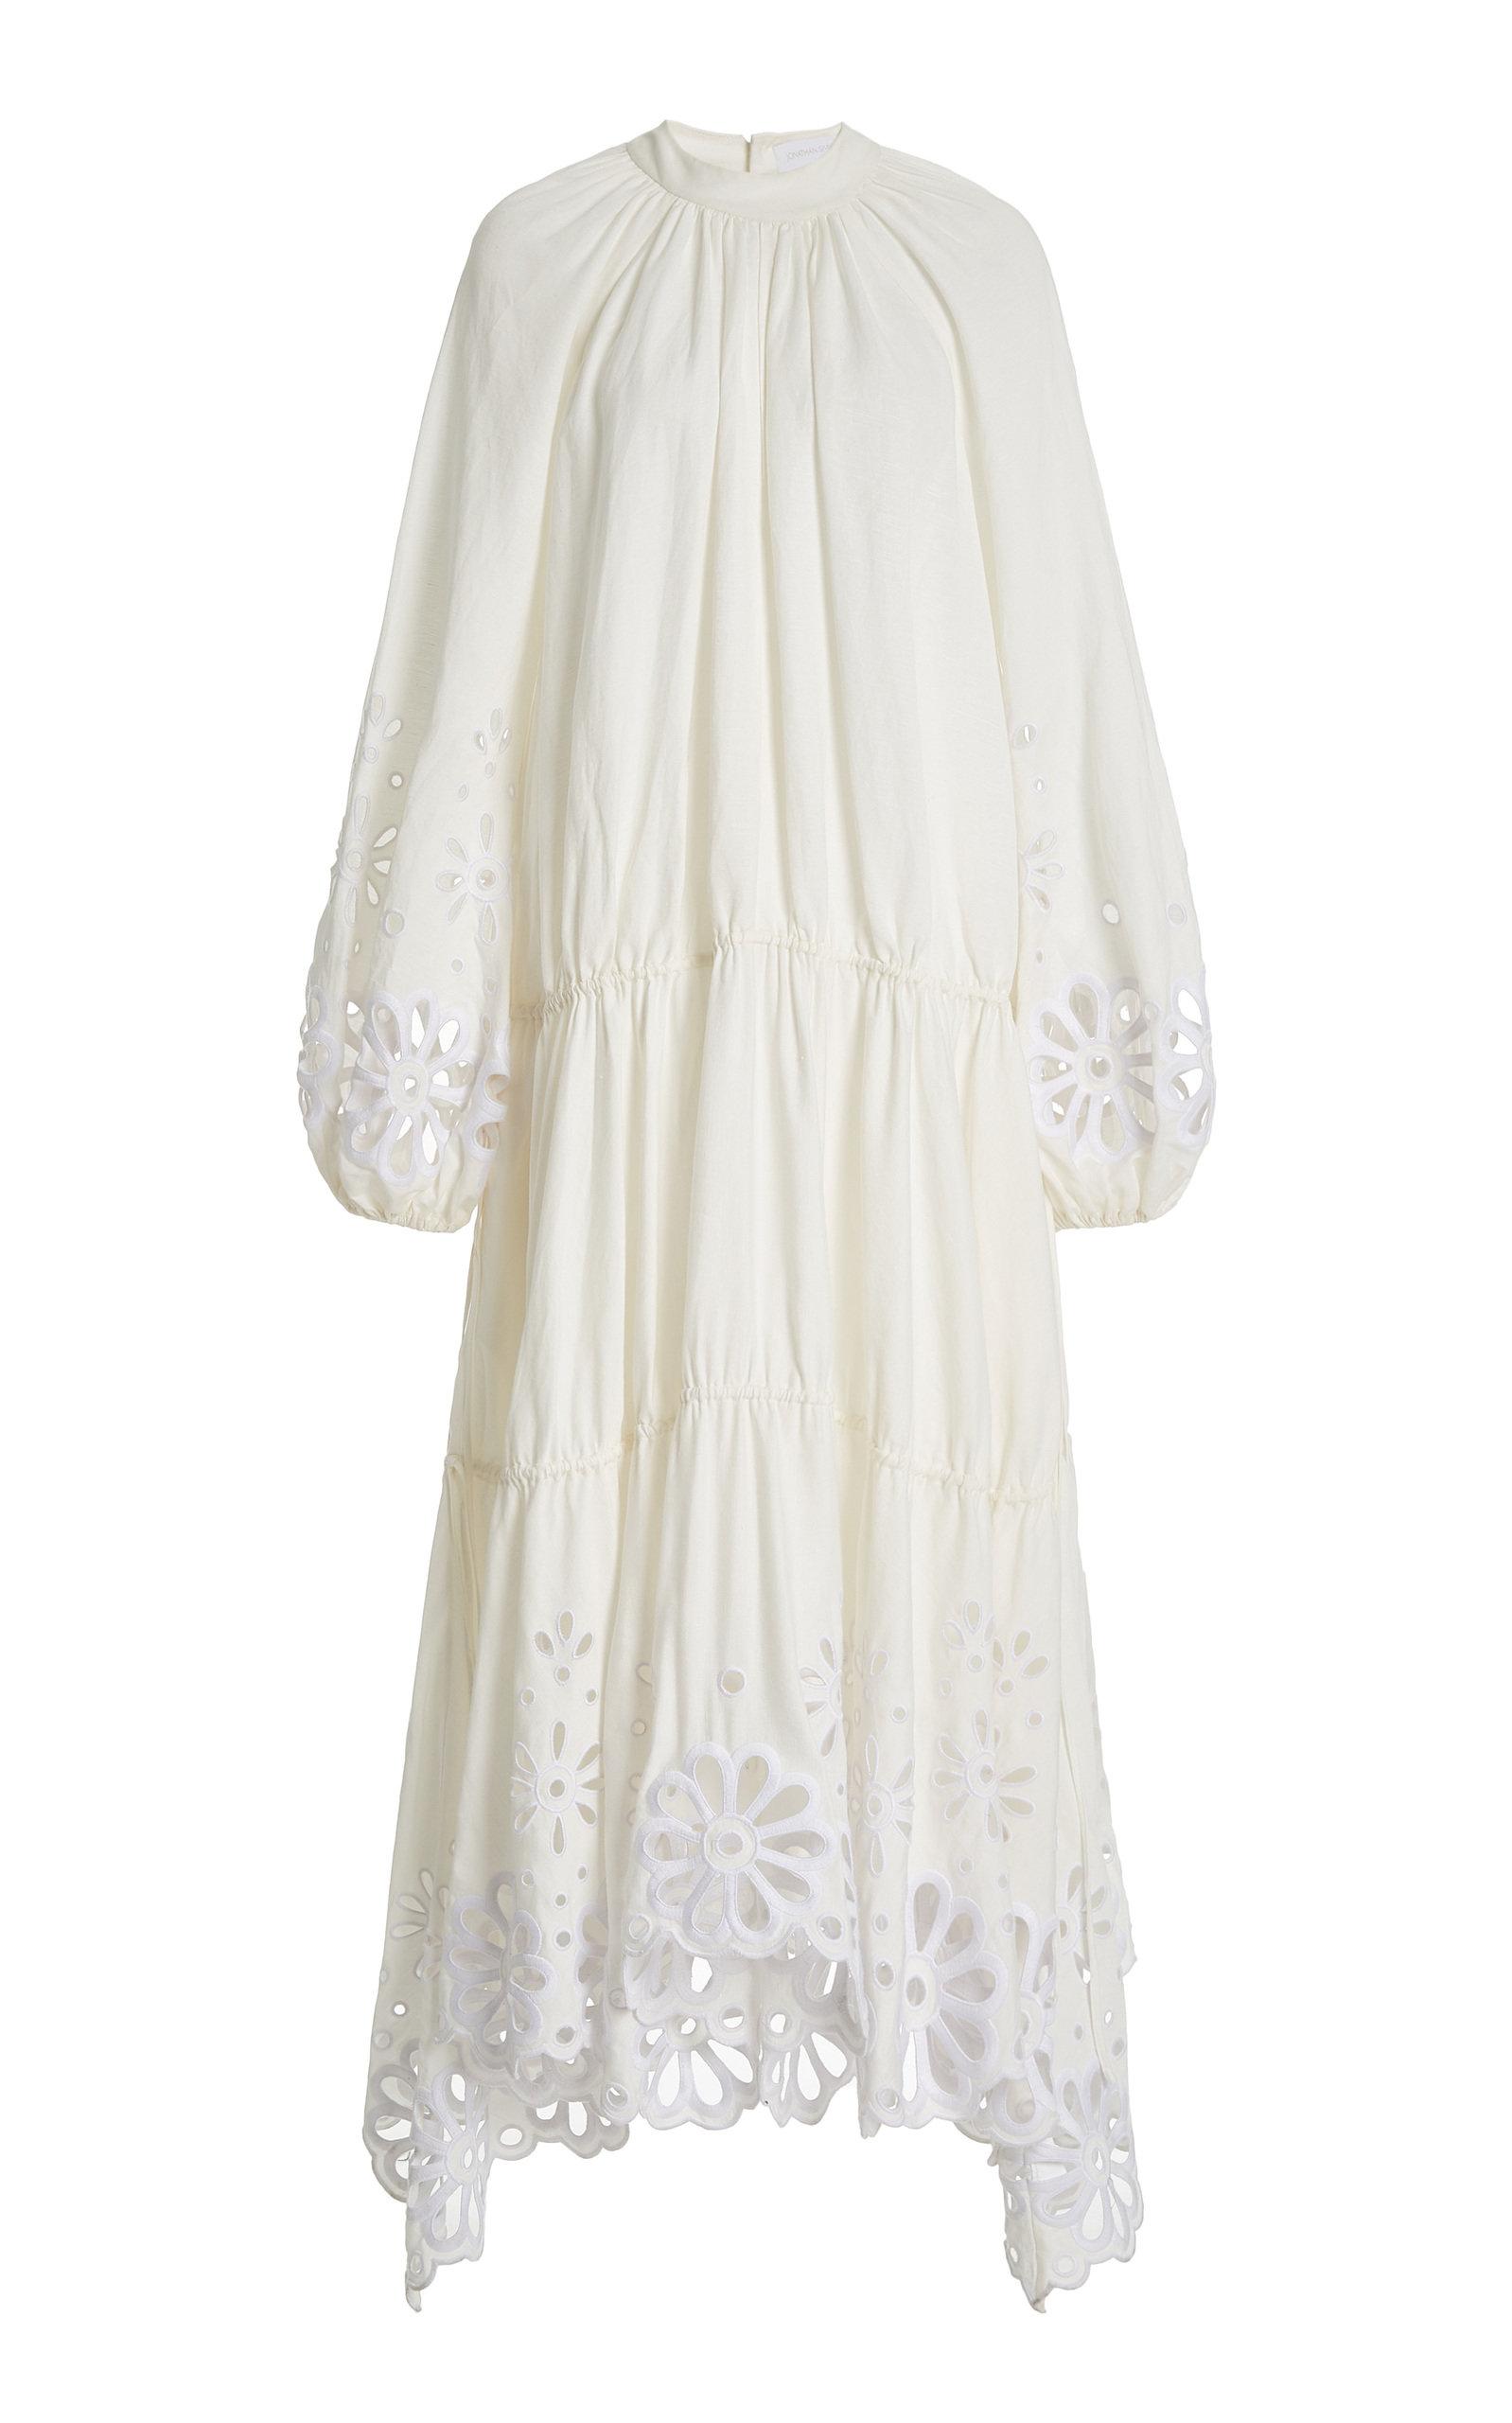 Jonathan Simkhai WOMEN'S ANISA BRODERIE ANGLAISE LINEN-BLEND MAXI DRESS